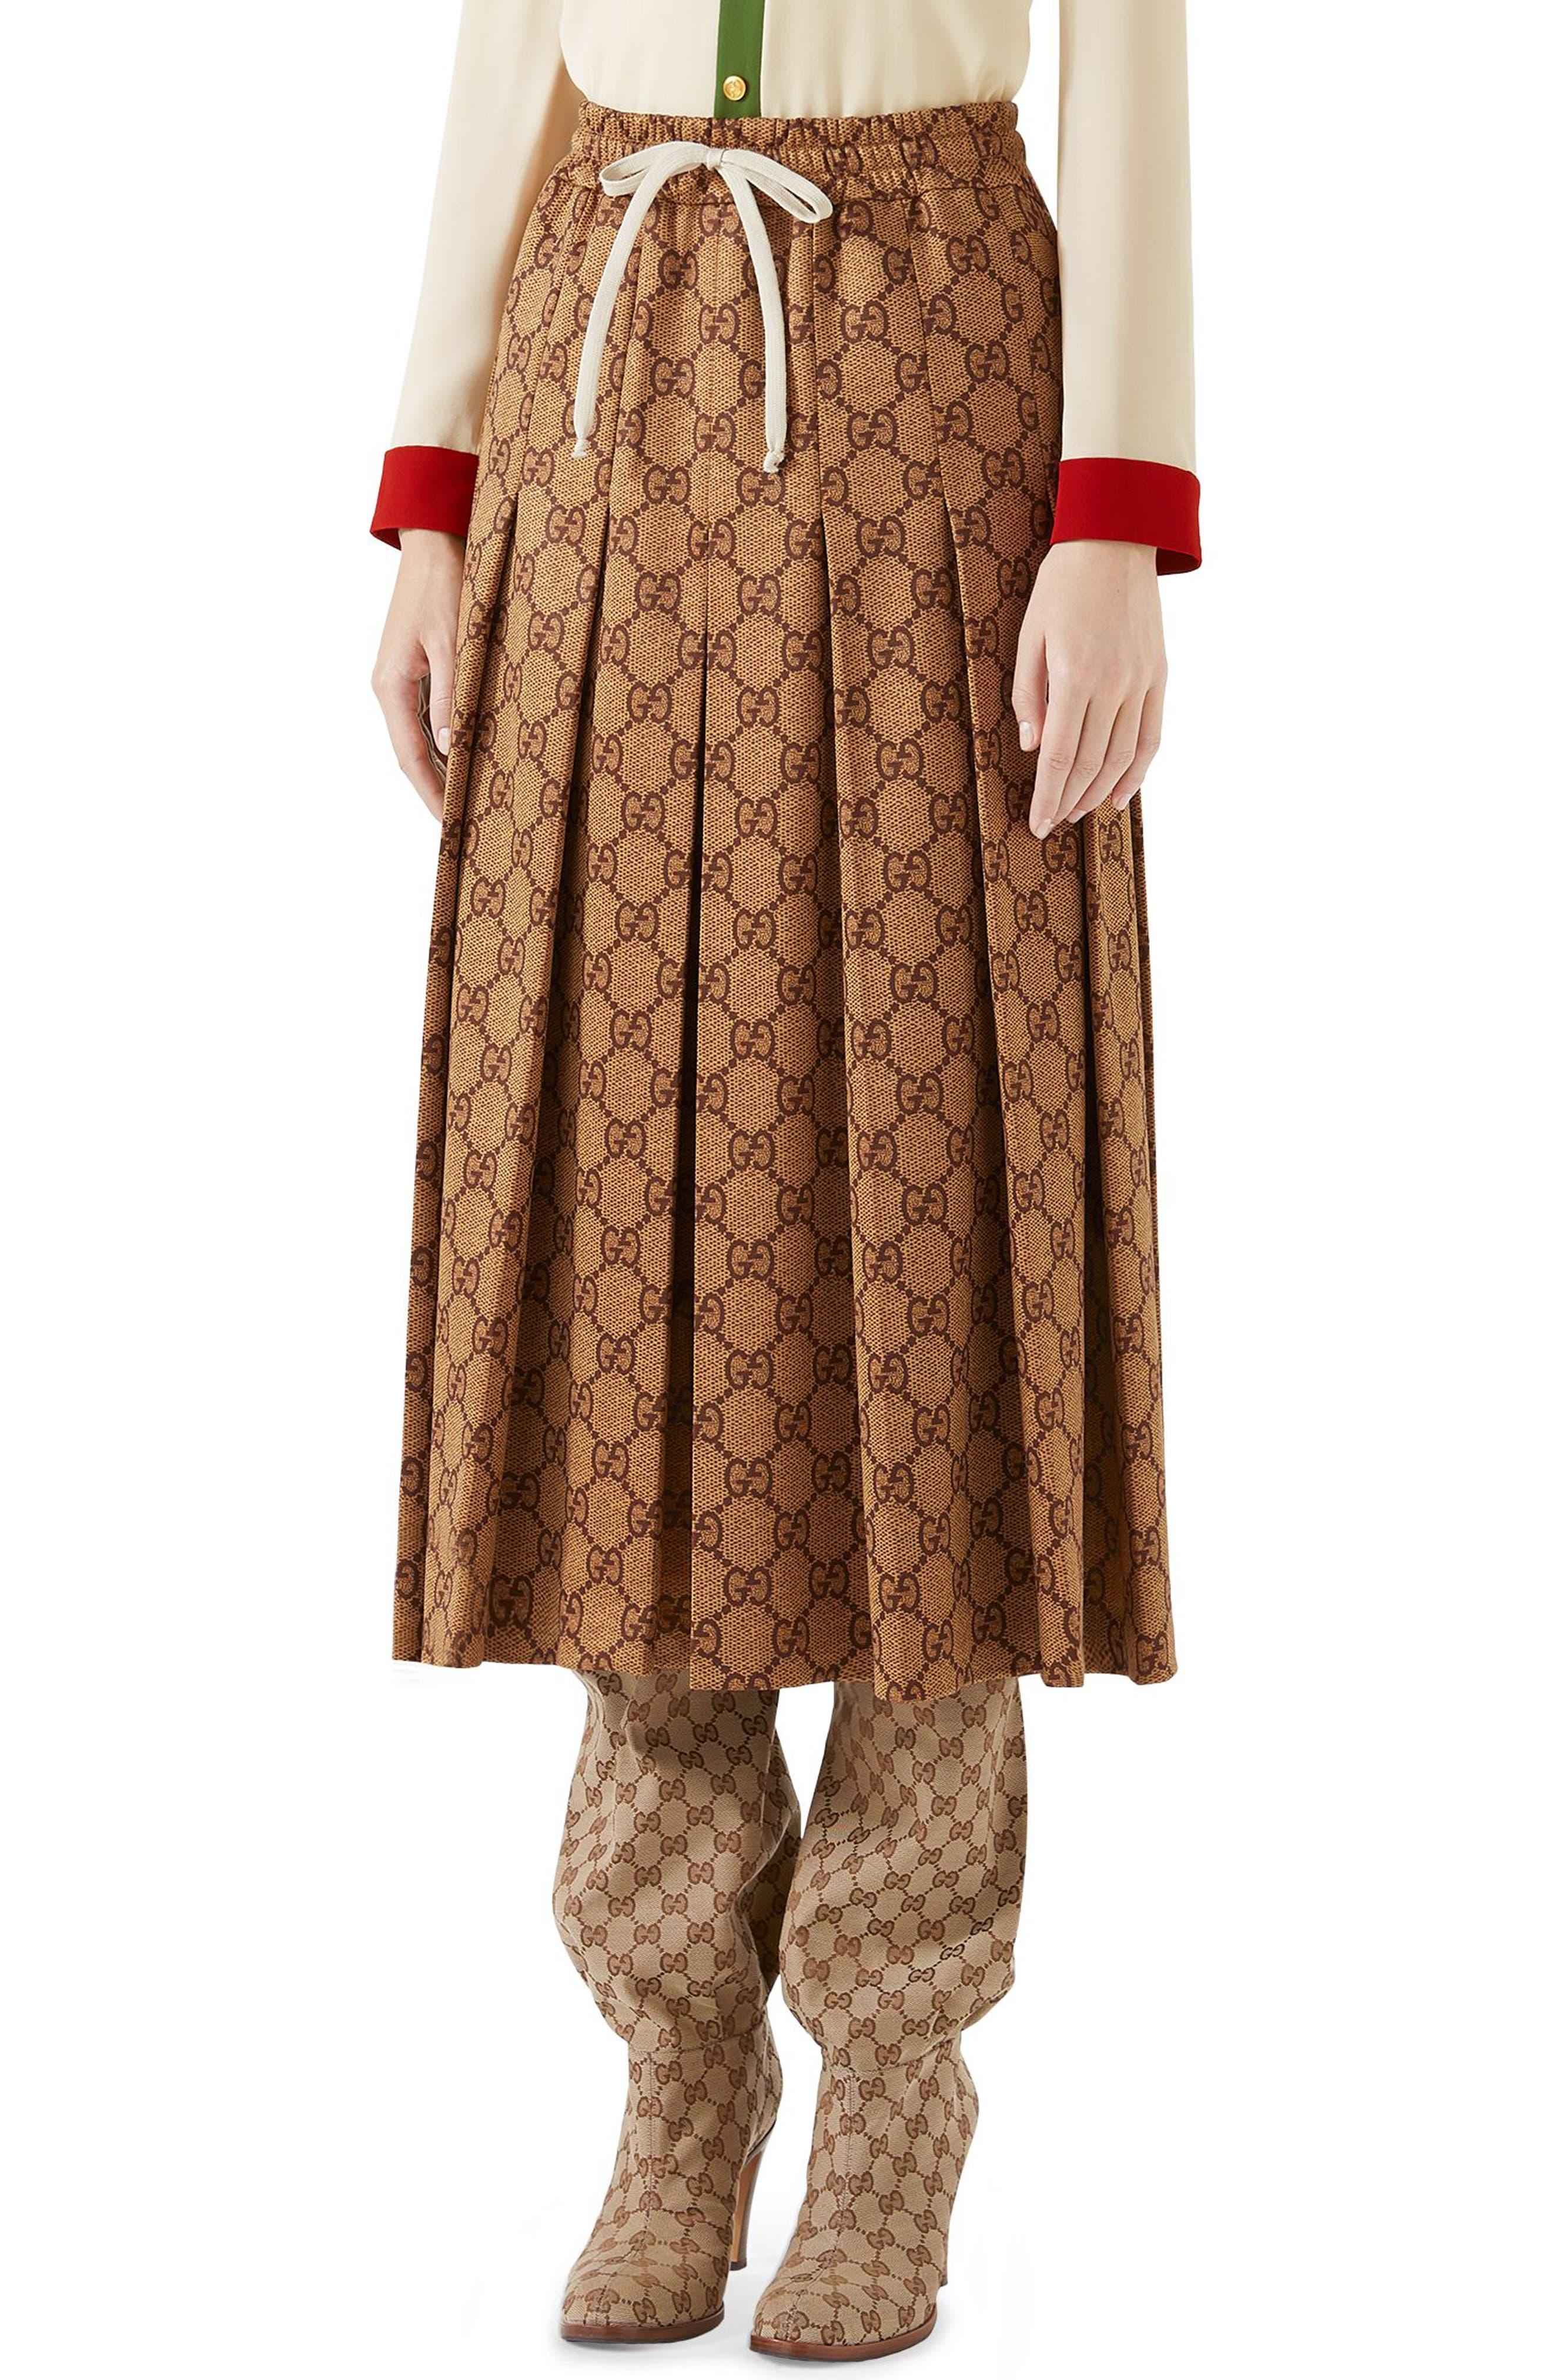 GG Print Pleated Midi Skirt,                             Main thumbnail 1, color,                             200